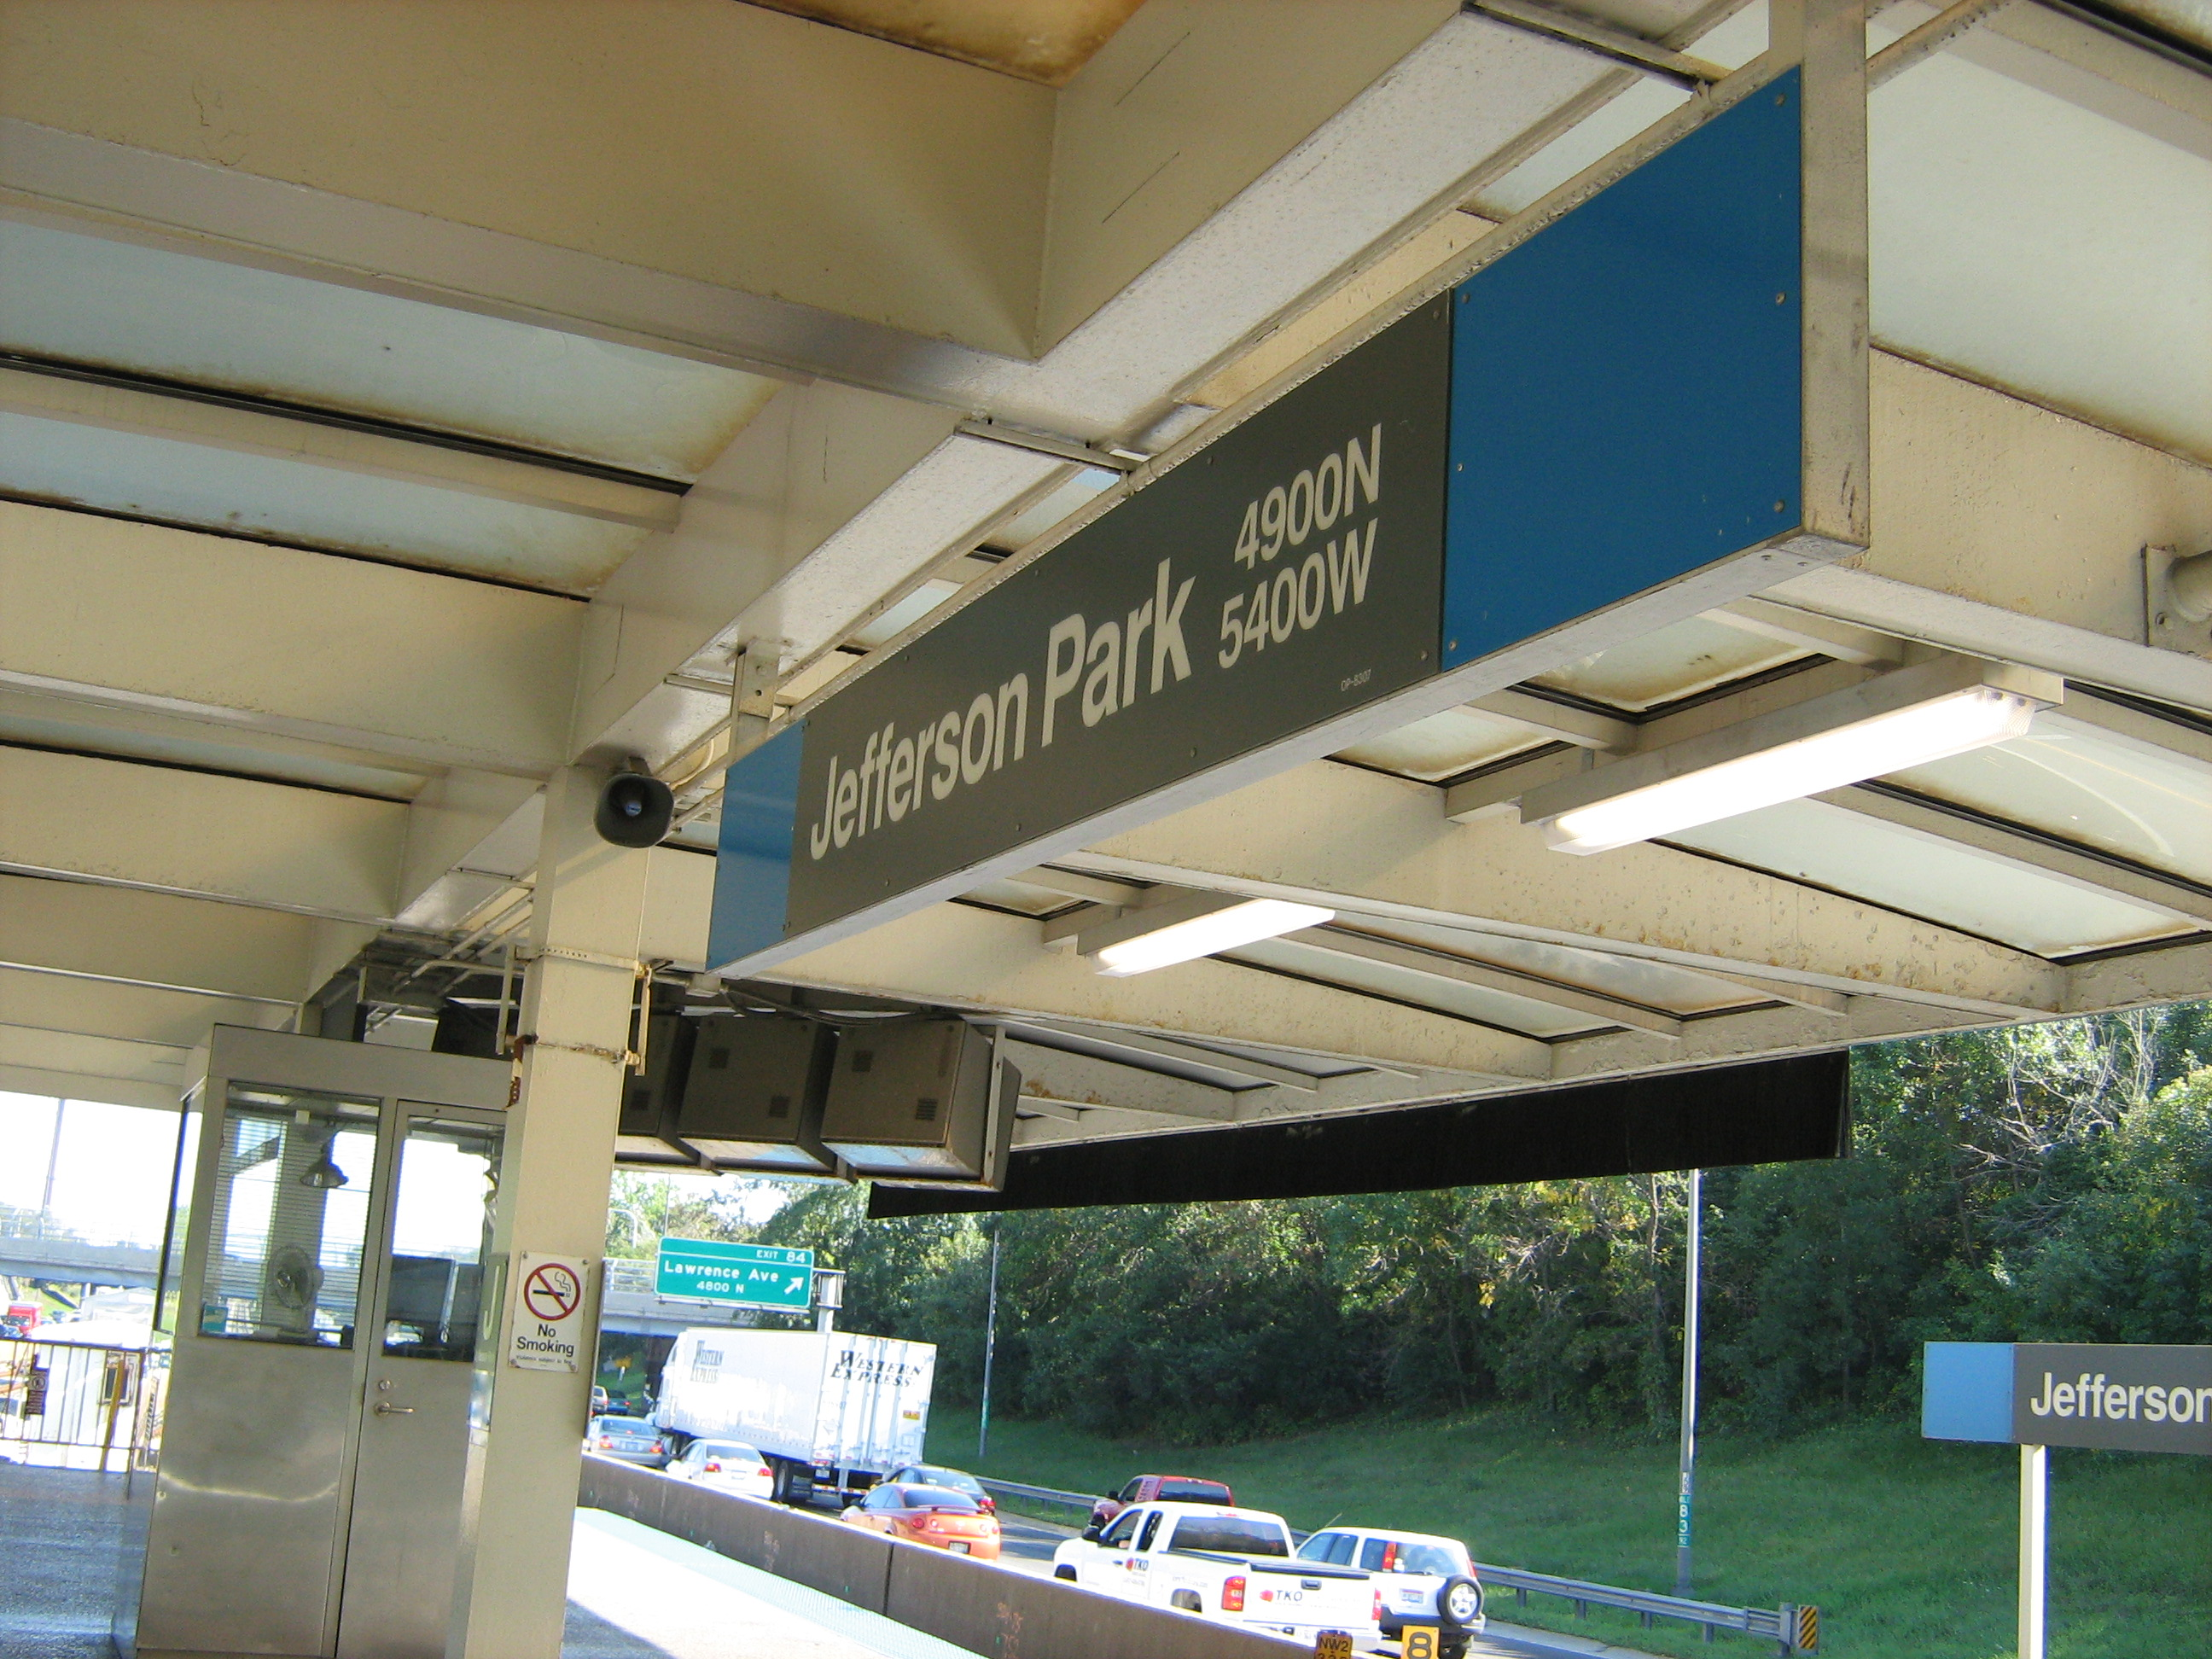 Jefferson Park Blue Line Station